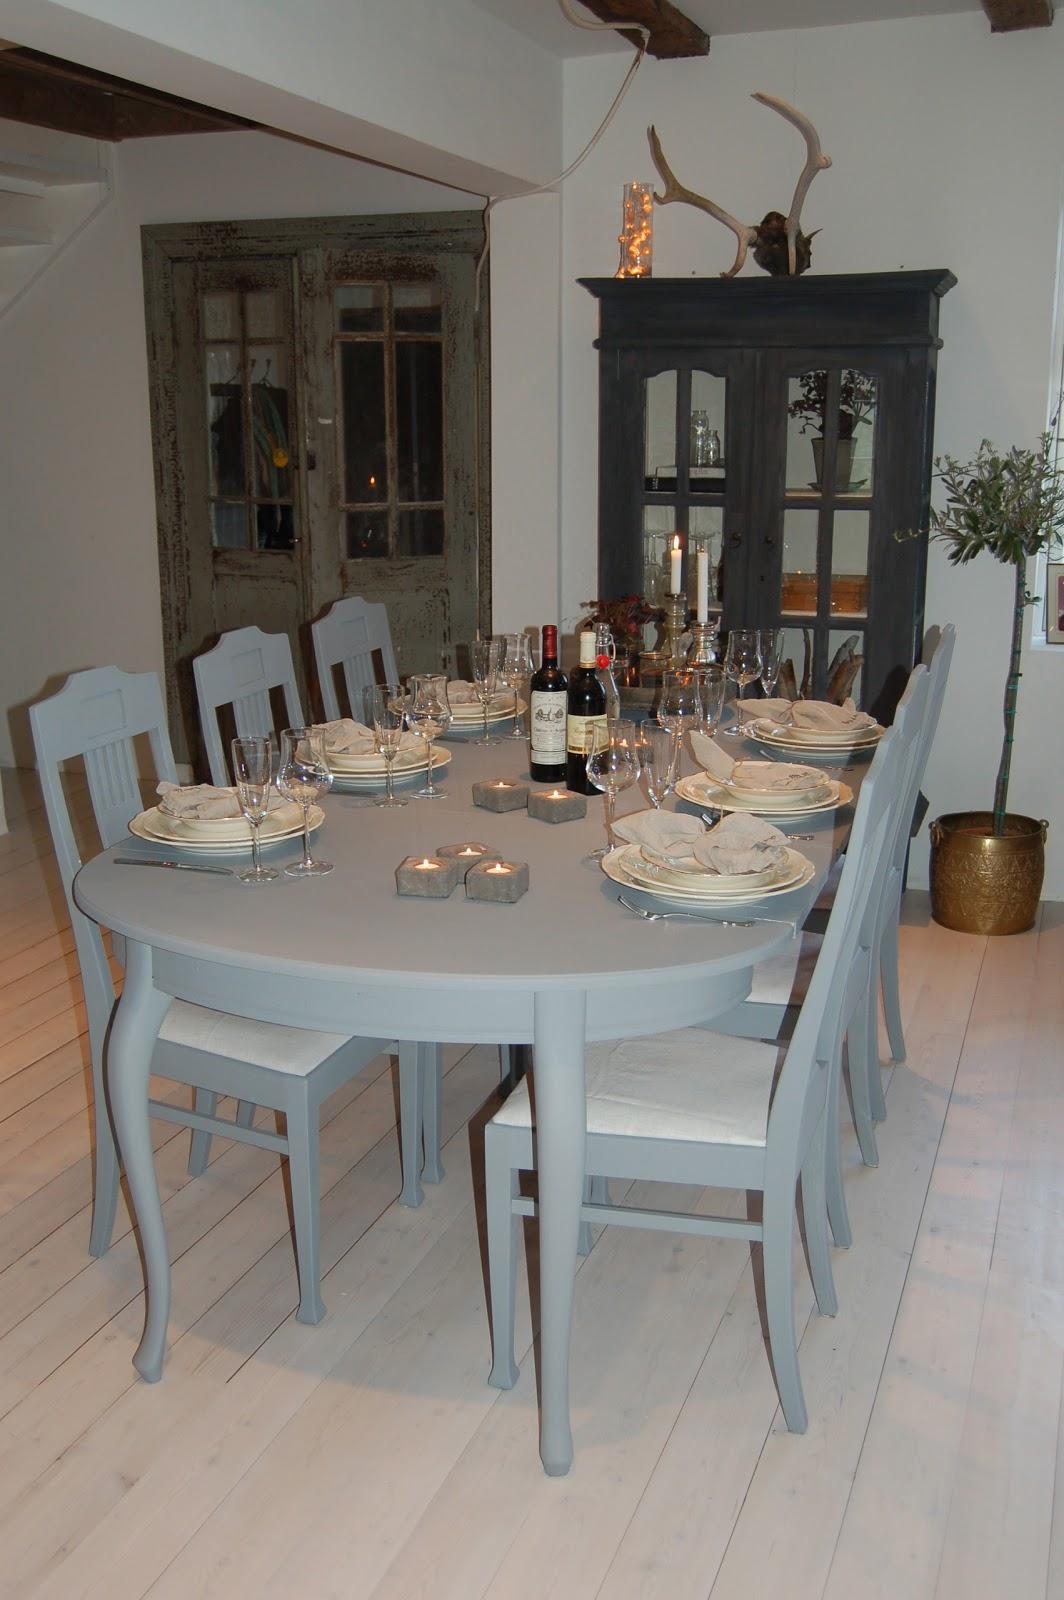 Karlottes hjem: new diningroom furniture`s anyone?!